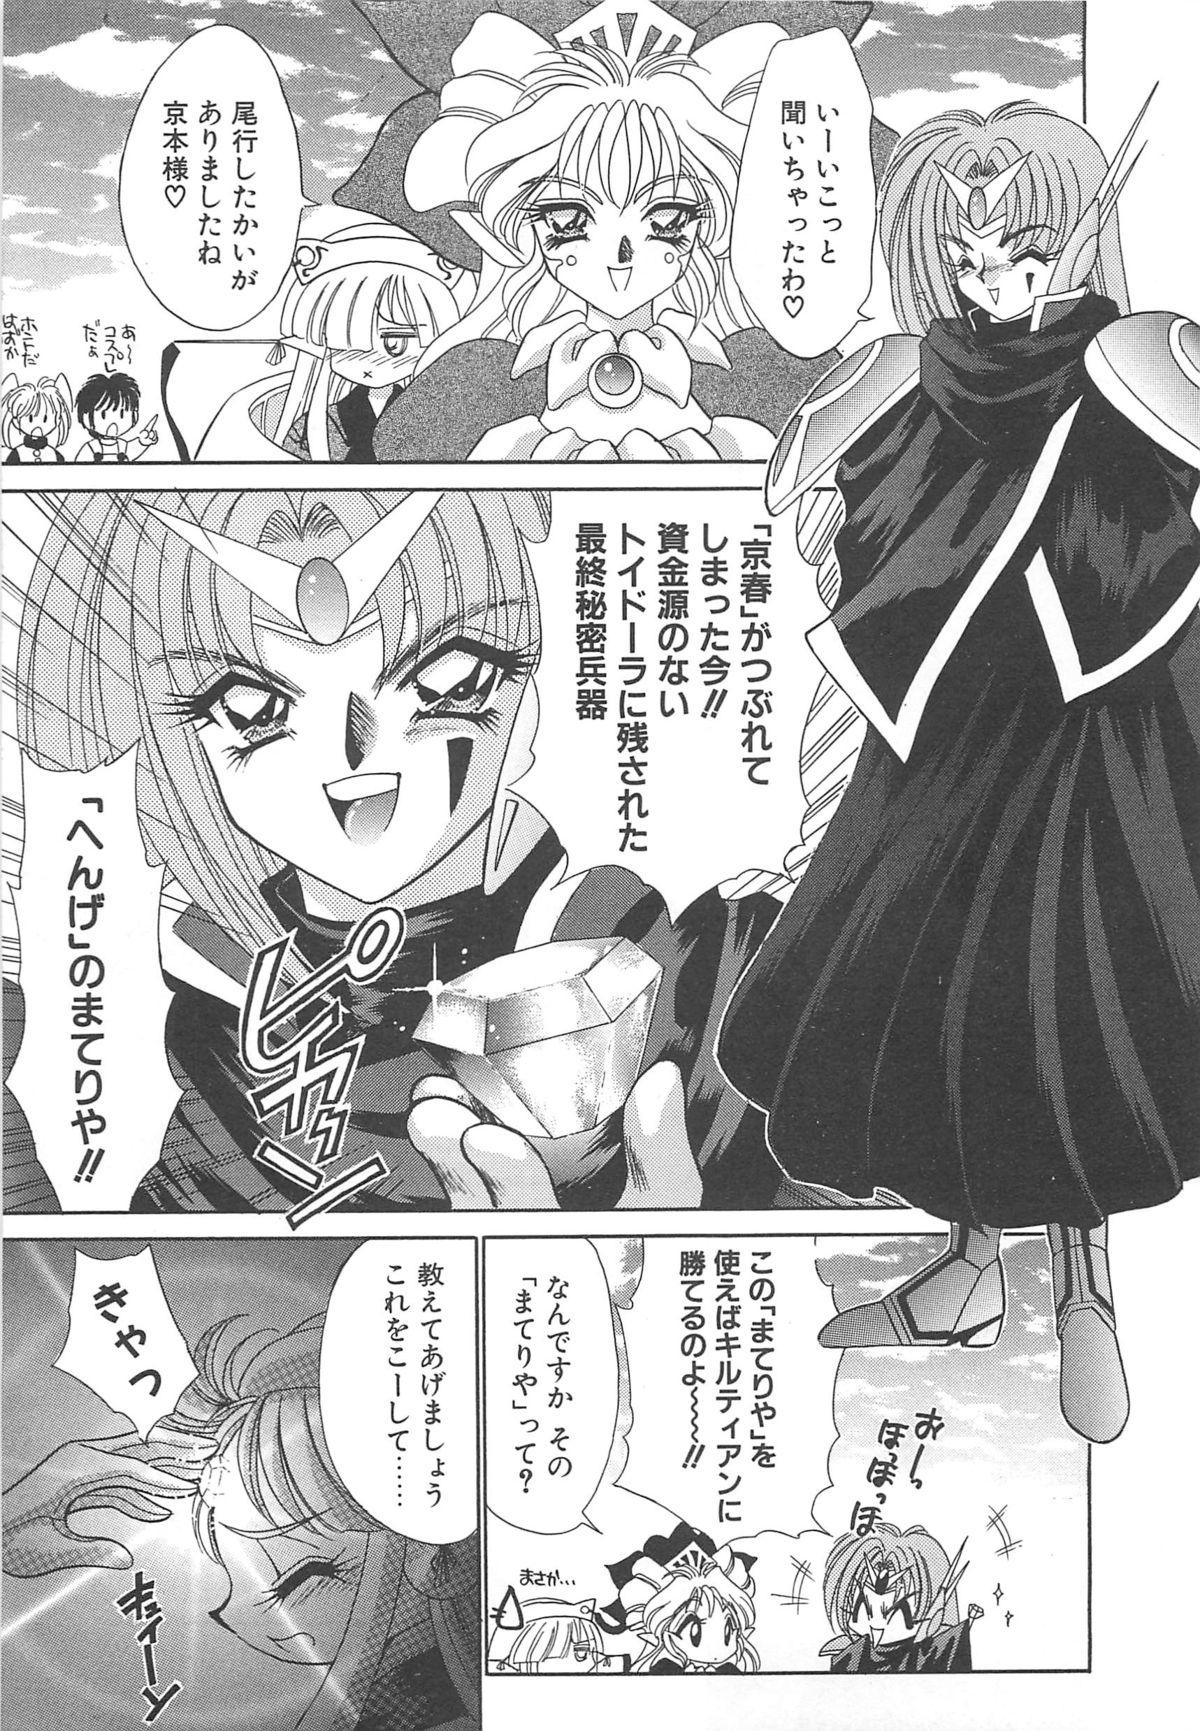 Kigurumi Sentai Quiltian 111